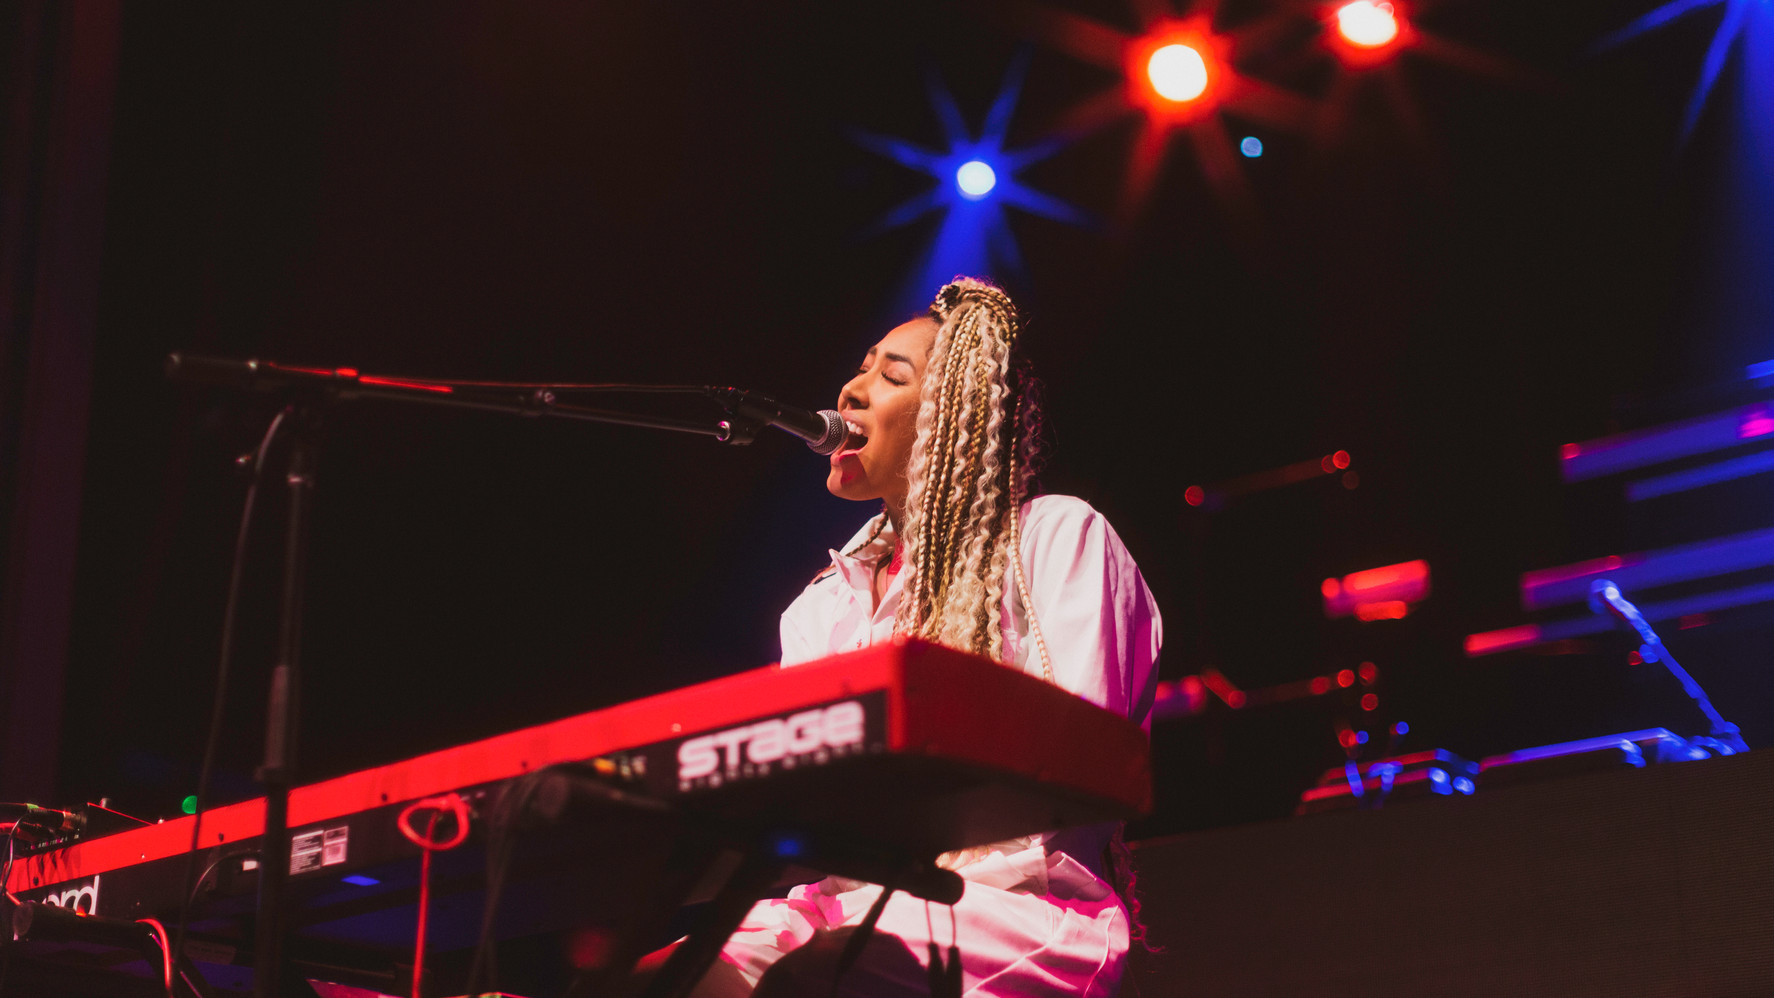 2.11.2020 Nikki Jean | Atmosphere | Regency Ballroom, SF, CA | Photographer: Brandon Crocker - Goldenvoice